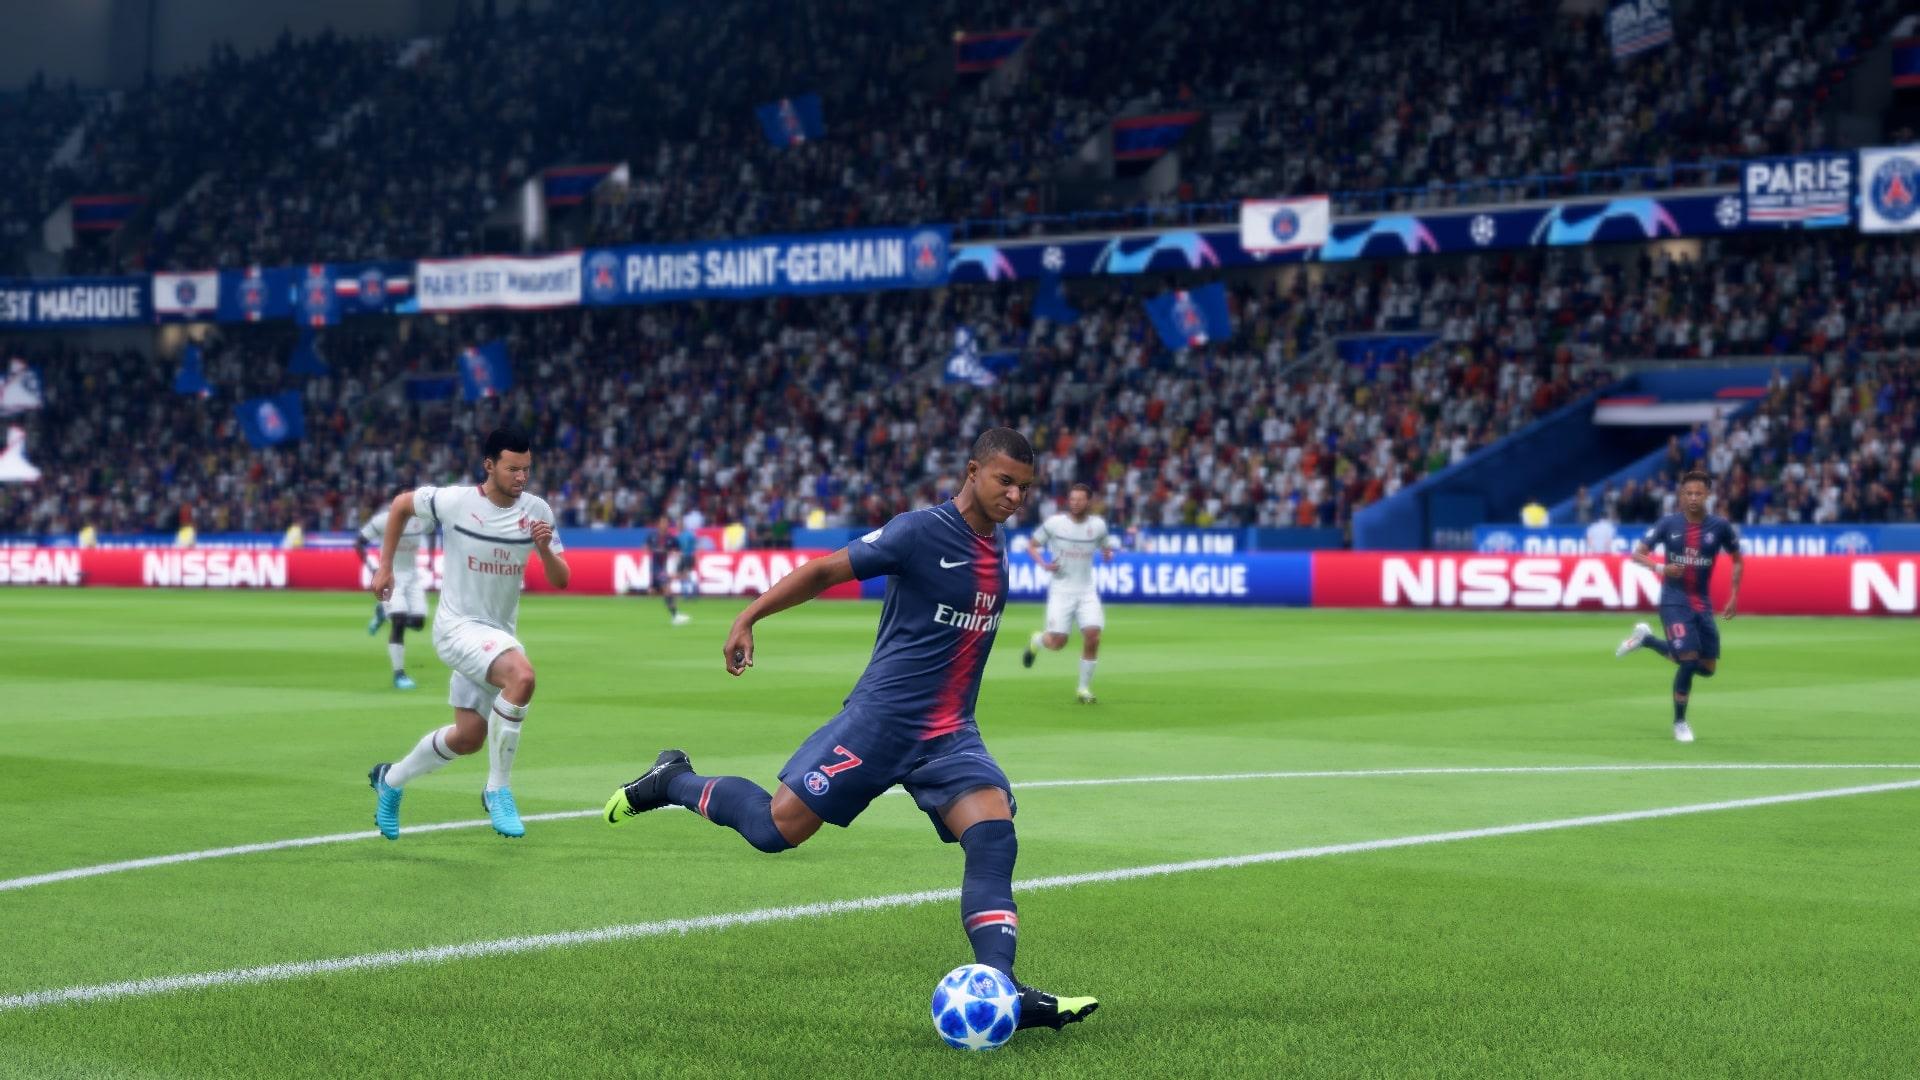 fifa-20-threaded-through-ball-pass